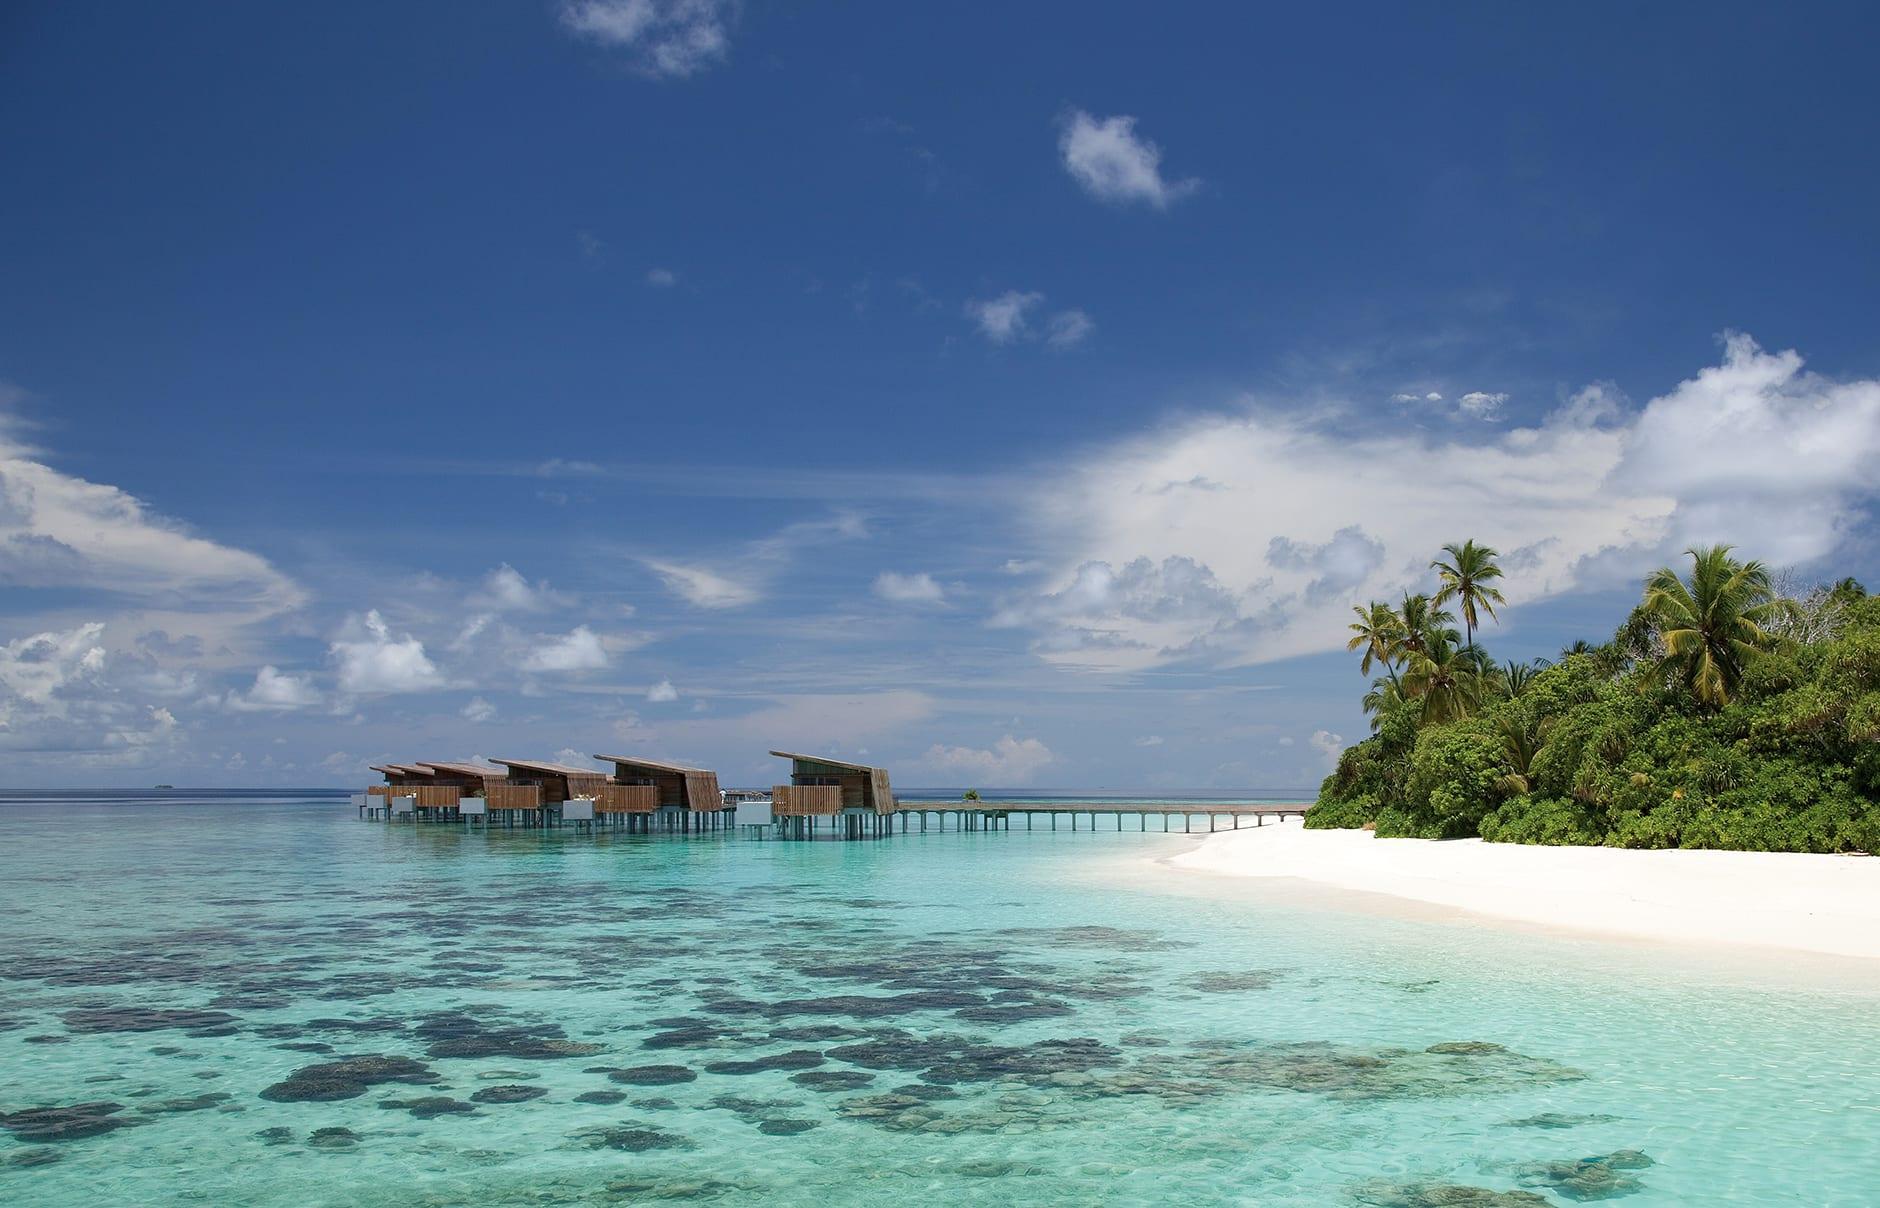 Park Hyatt Maldives, Hadahaa, Maldives. Hotel Review by TravelPlusStyle. Photo © Hyatt Corporation